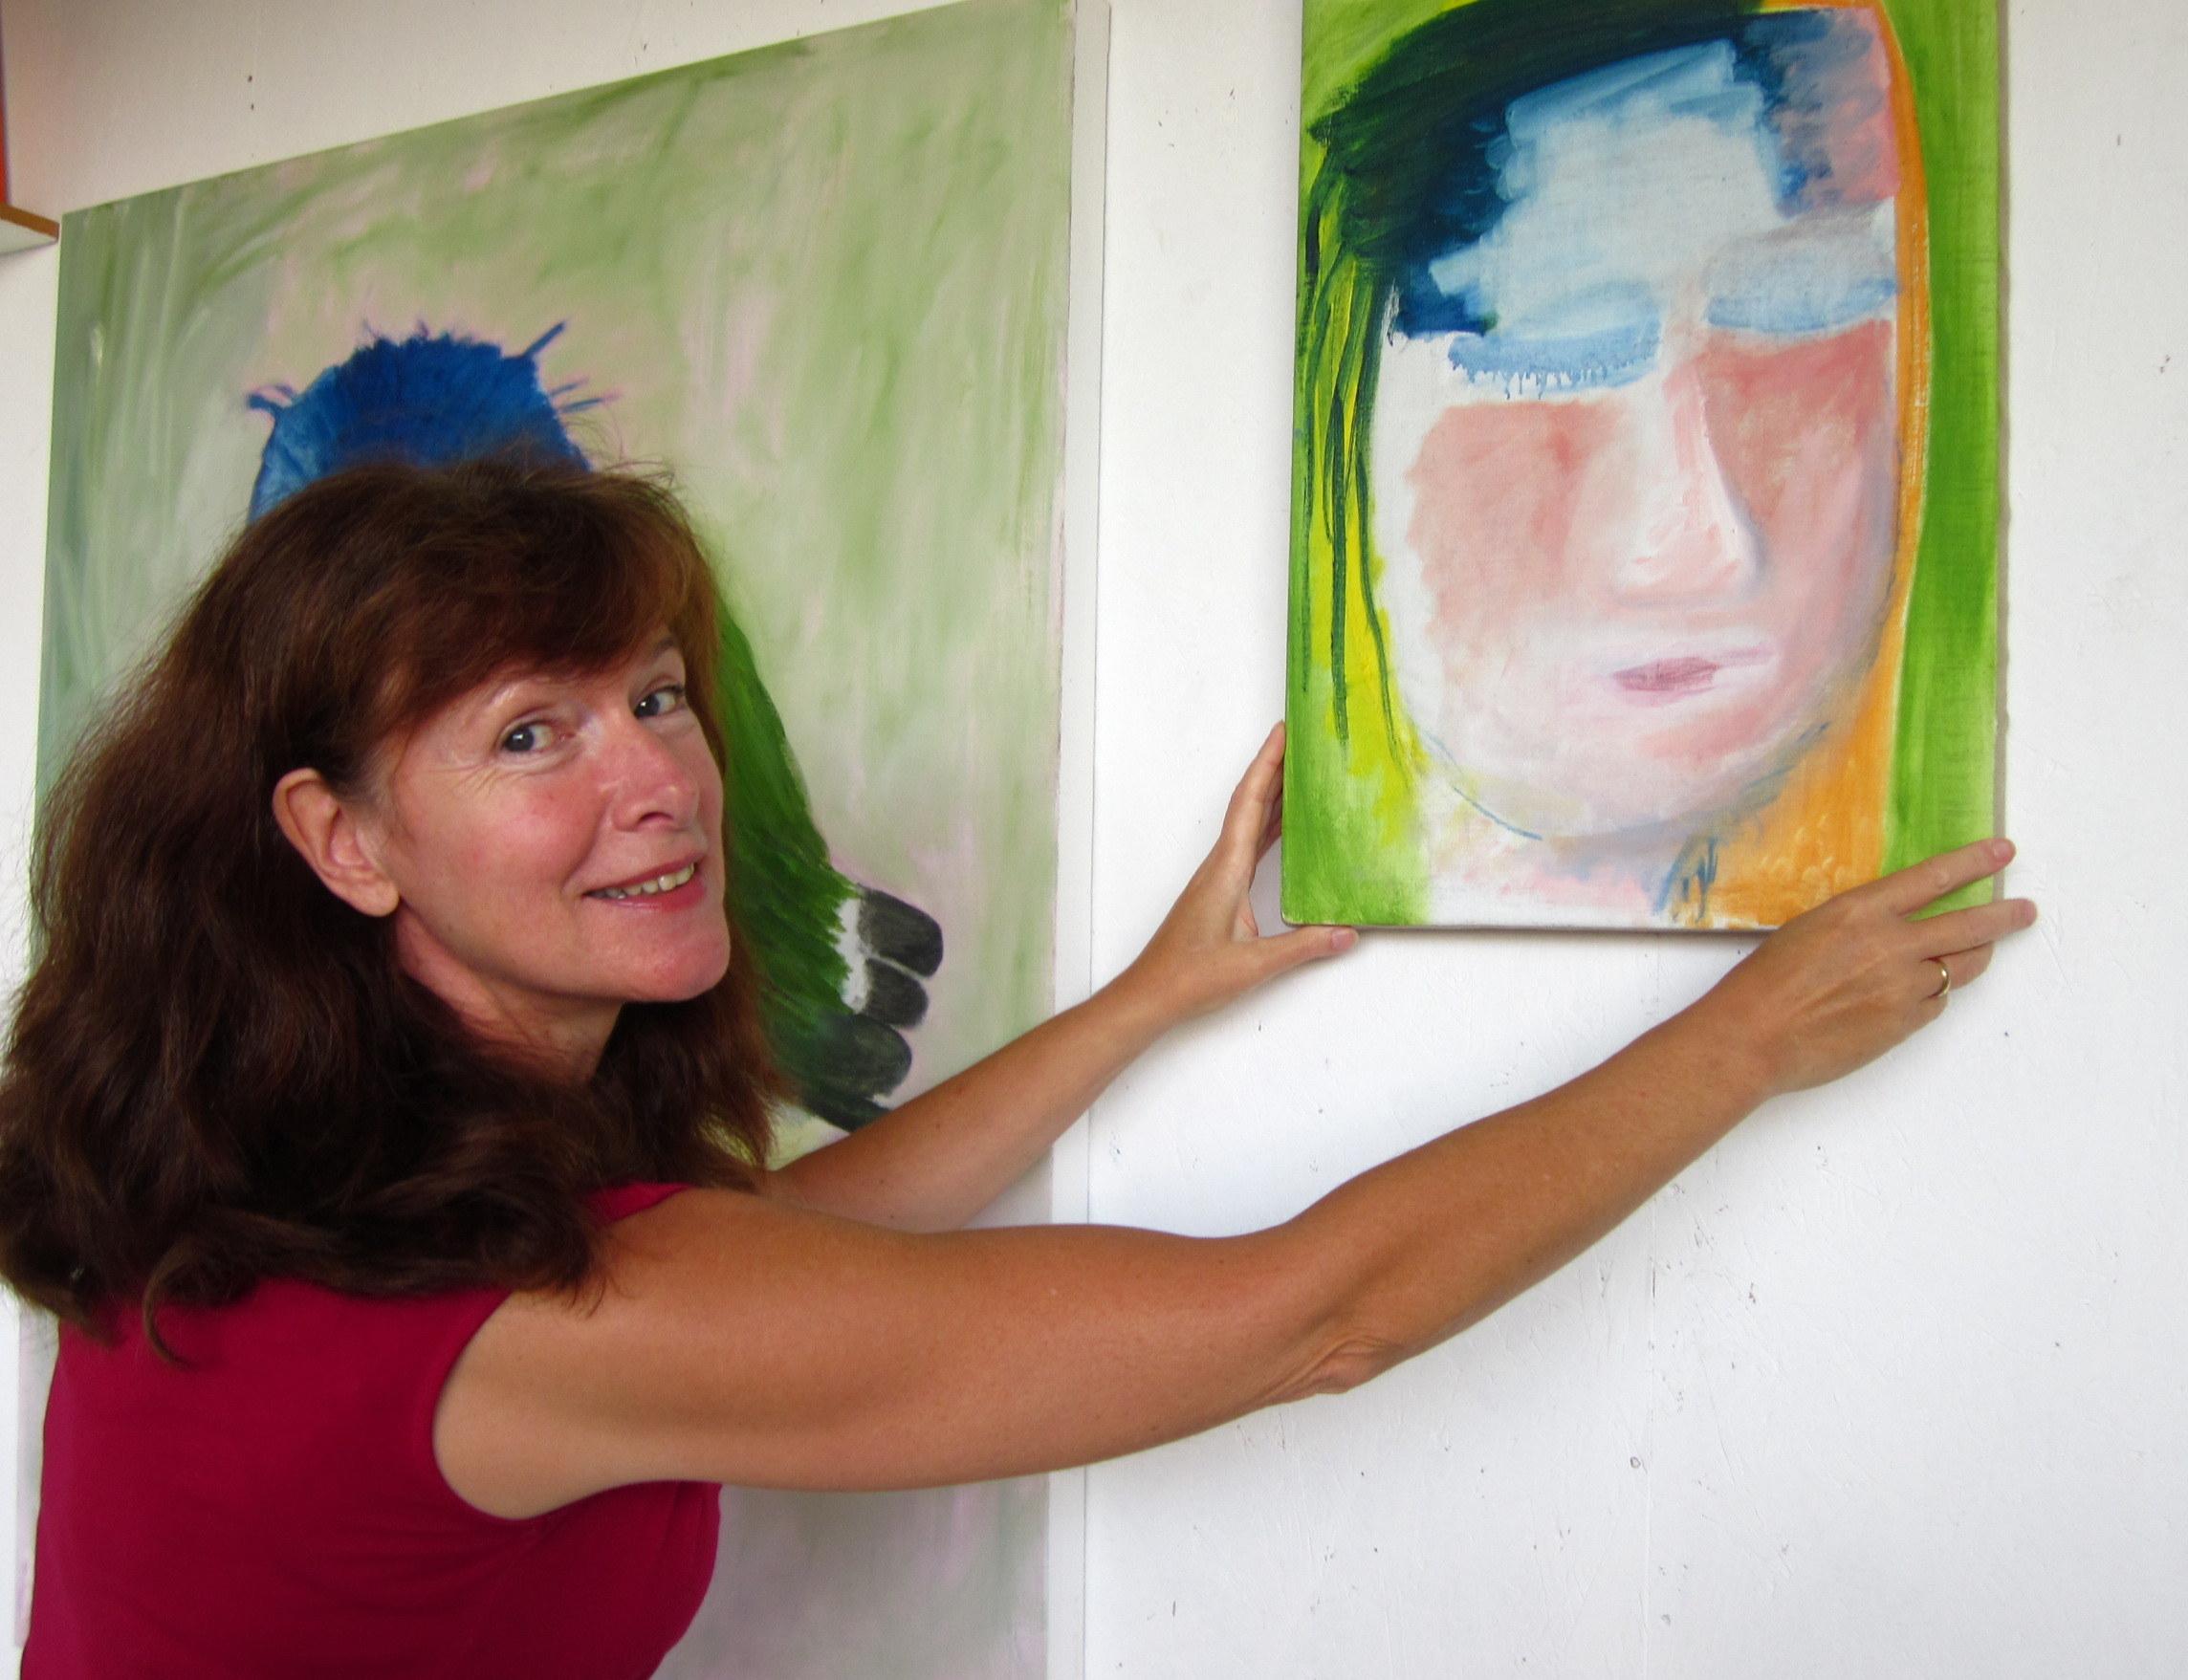 Kunstenaar Wietske Lycklama à Nijeholt, hedendaagse-schilderkunst, hedendaagse-kunst